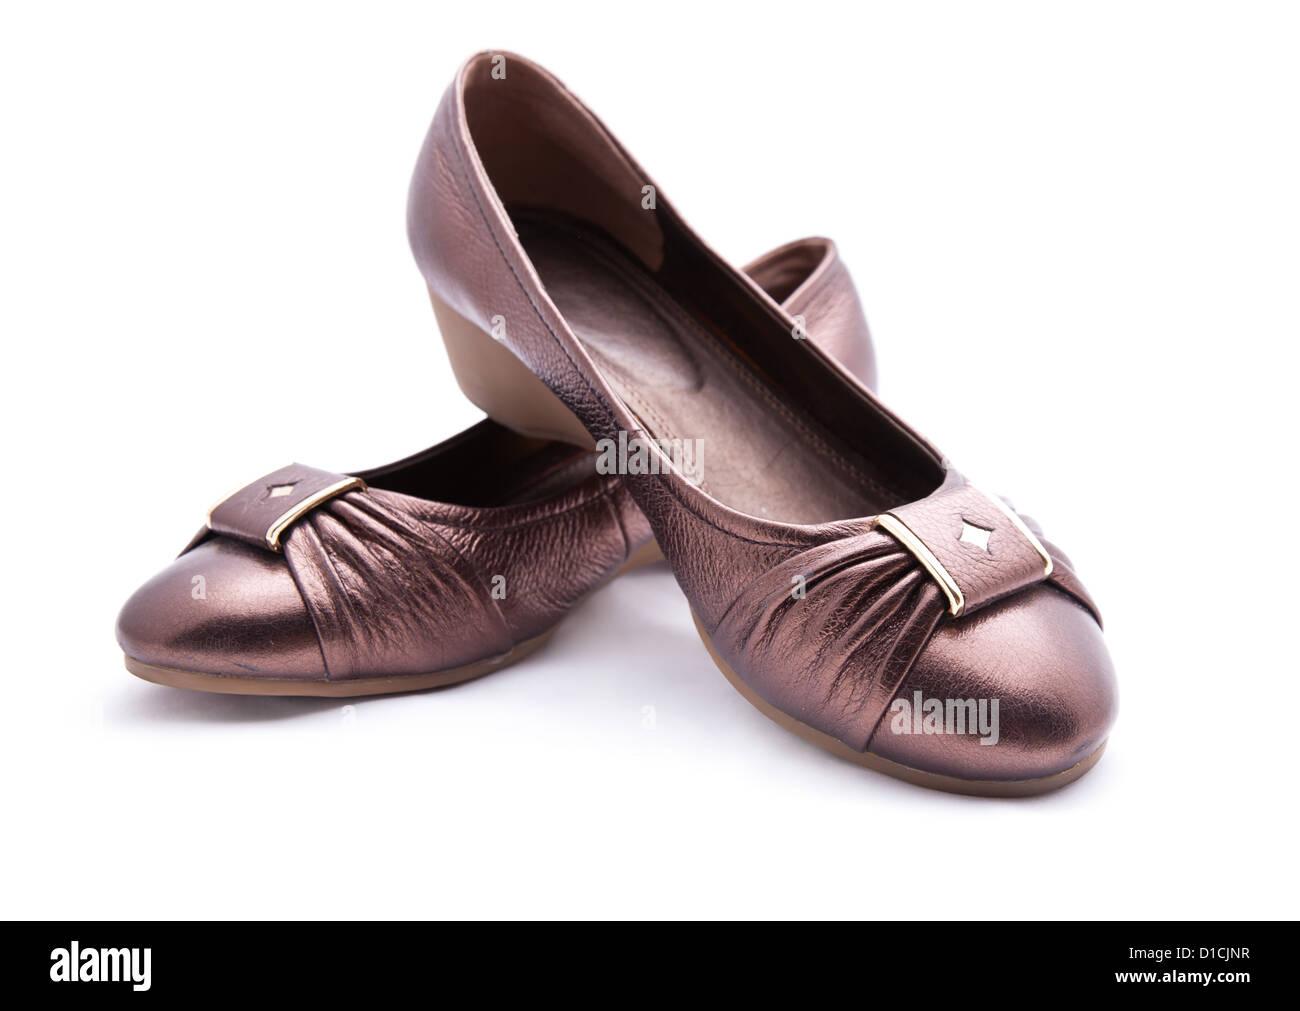 566fdbeb female dress shoes on white Stock Photo: 52523907 - Alamy